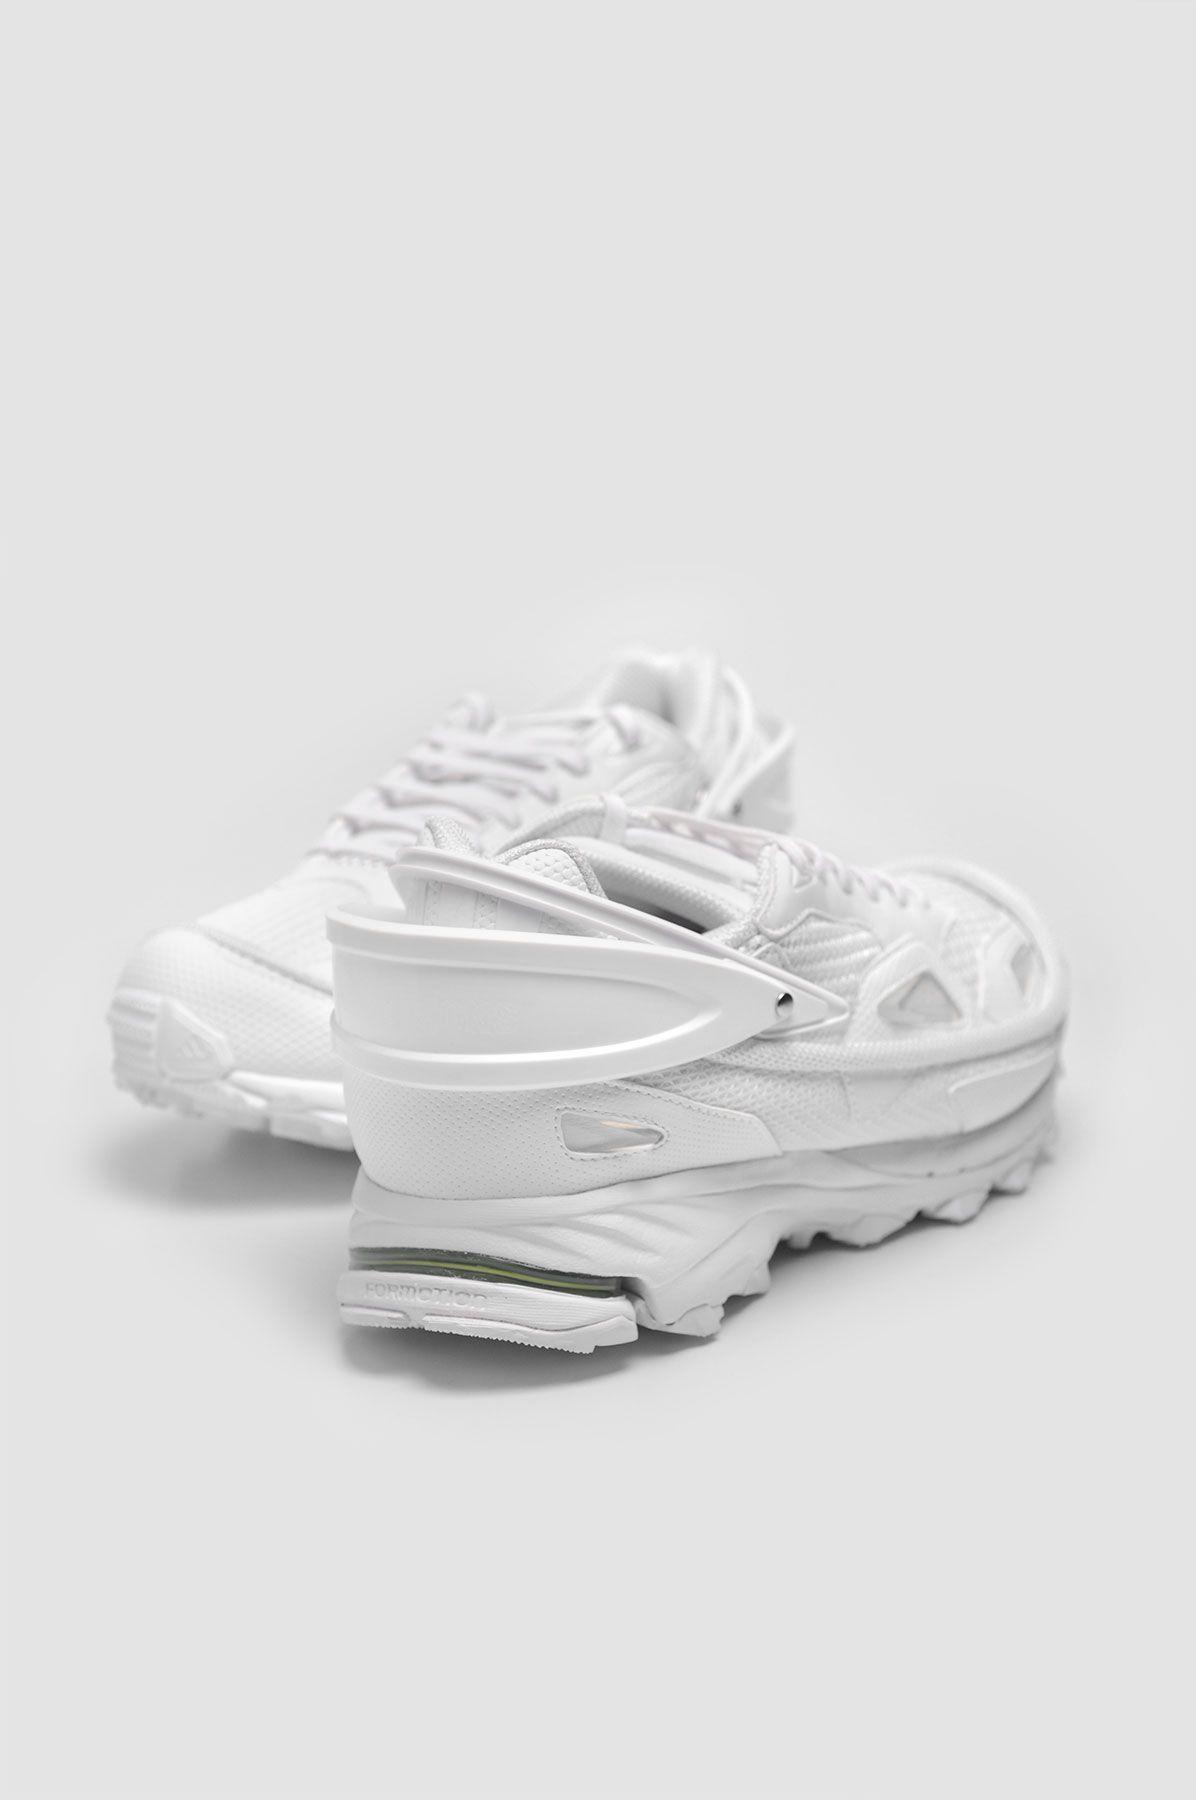 f479d6e464094a ADIDAS X RAF SIMONS Response Trail 2 All White Sneakers   鞋 ...